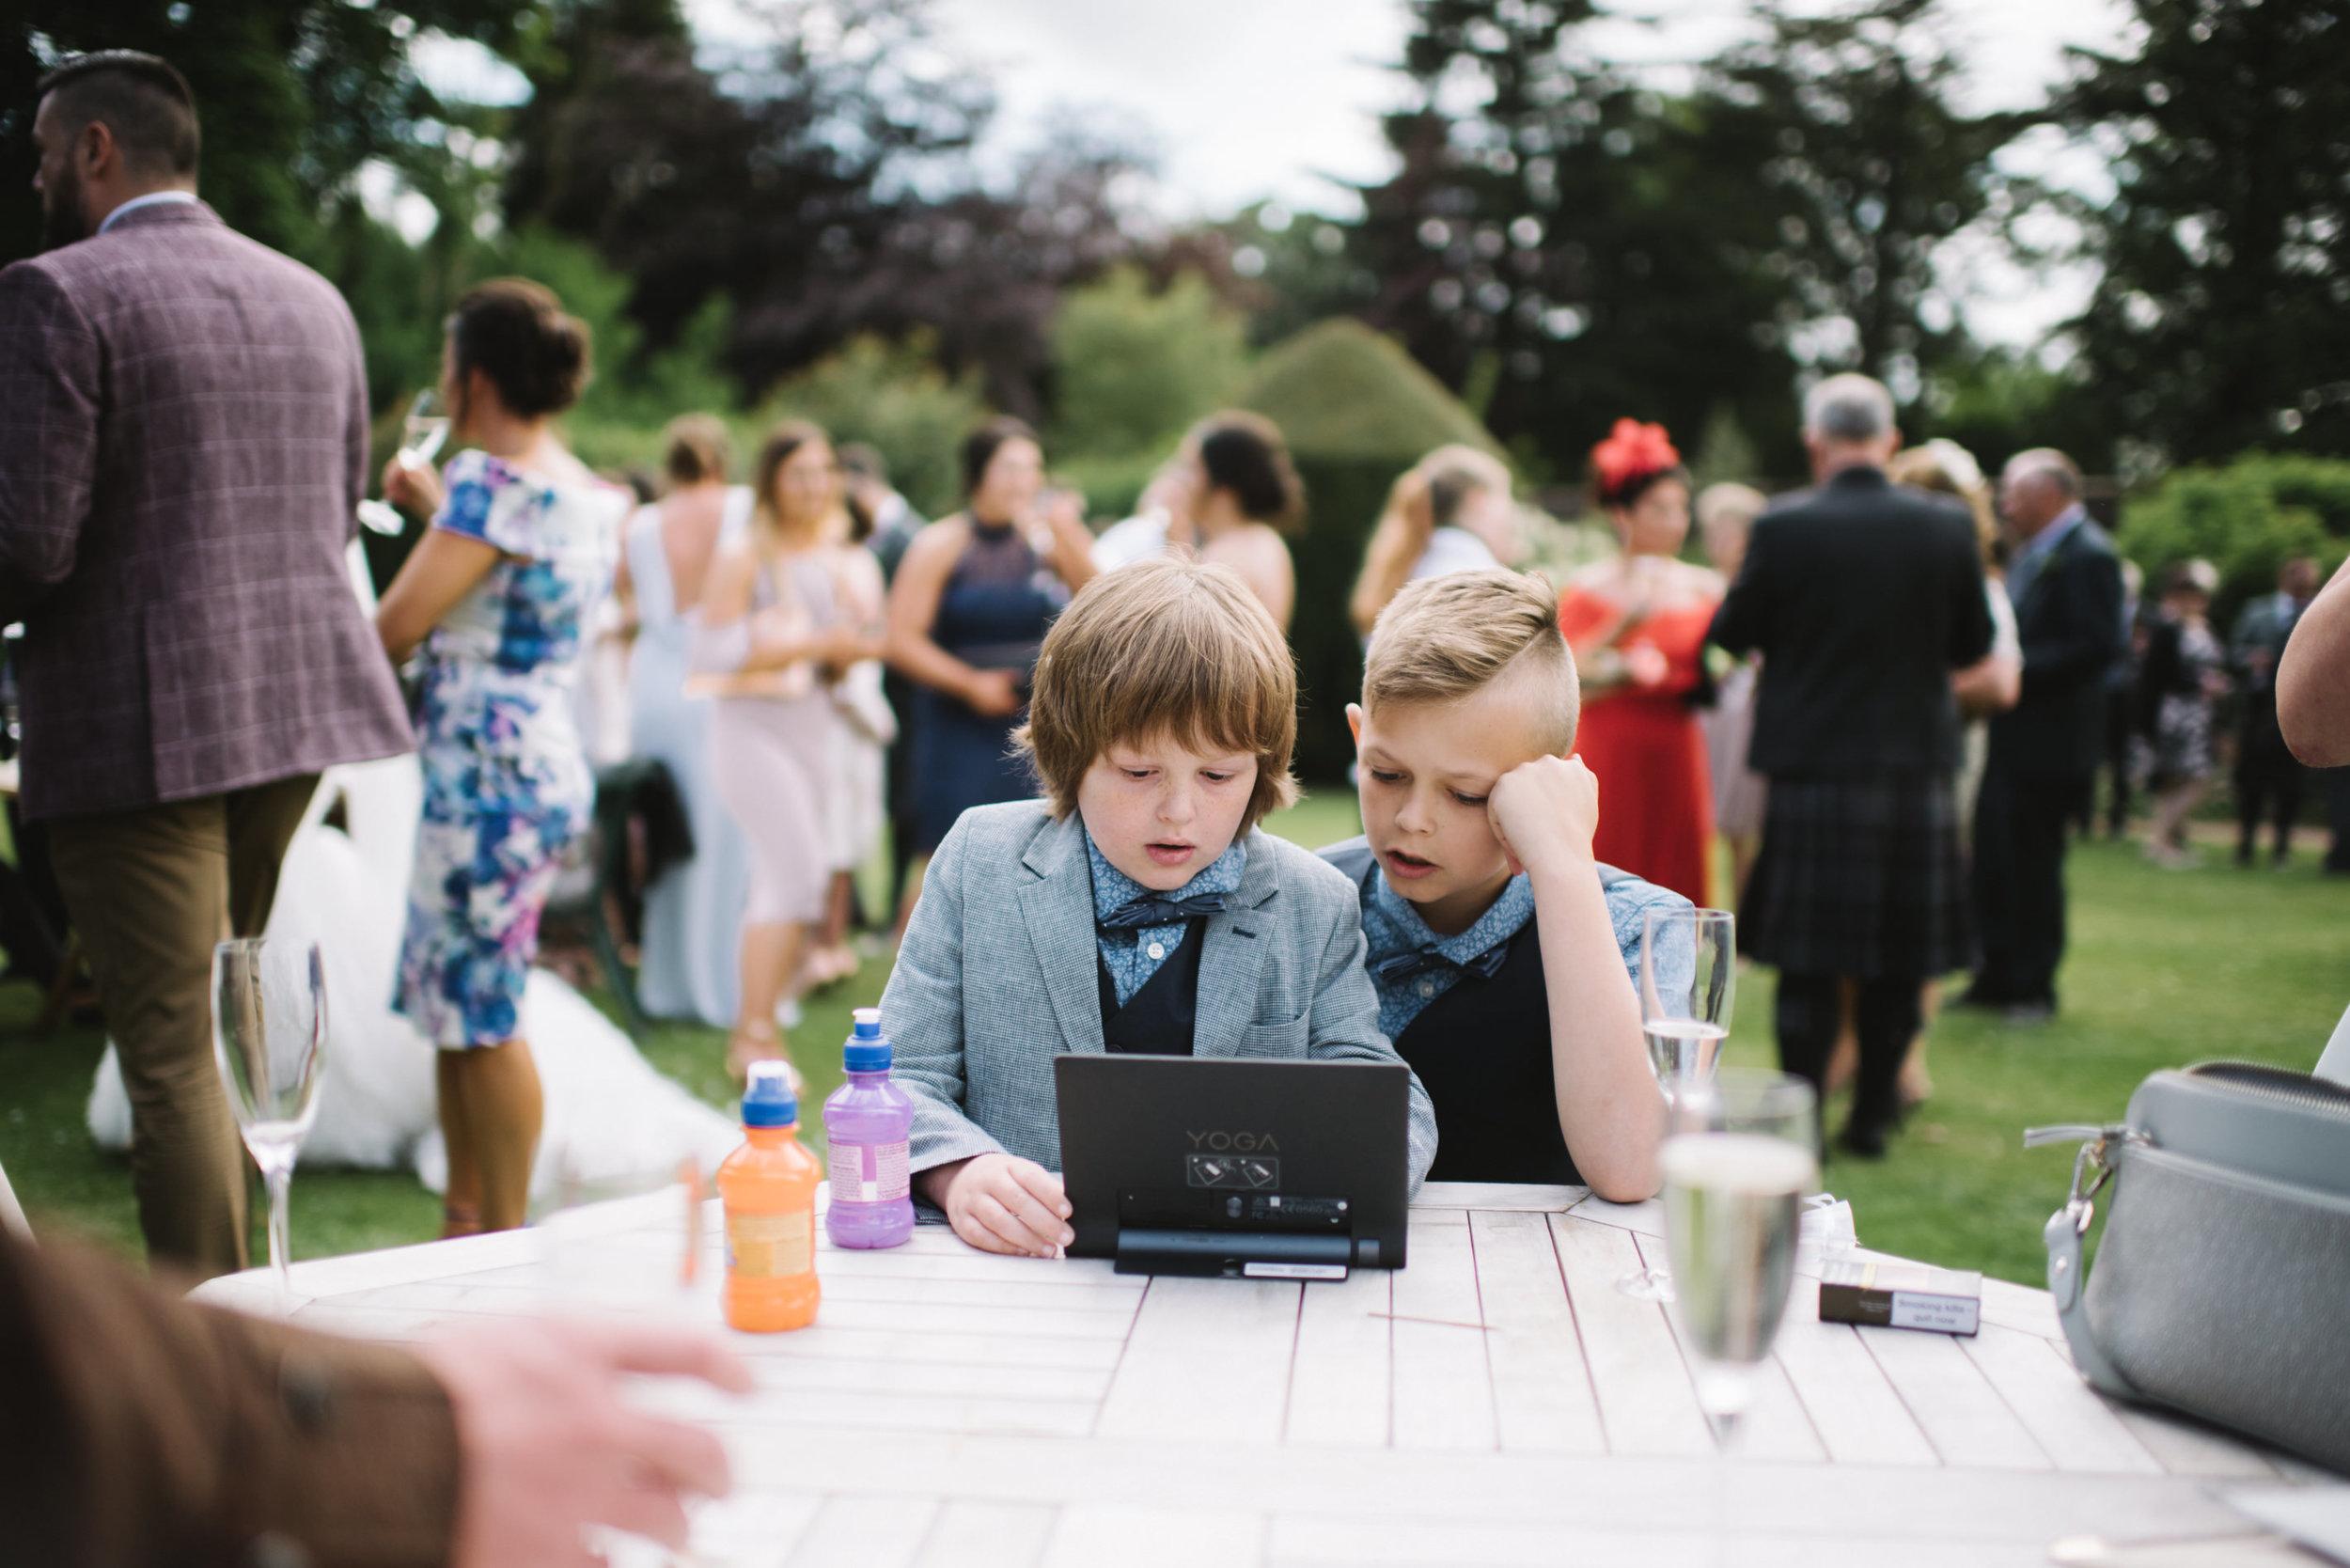 0013-LISA-DEVINE-PHOTOGRAPHY-ALTERNATIVE-WEDDING-PHOTOGRAPHY-SCOTLAND-DESTINATION-WEDDINGS-GLASGOW-WEDDINGS-COOL-WEDDINGS-STYLISH-WEDDINGS.JPG